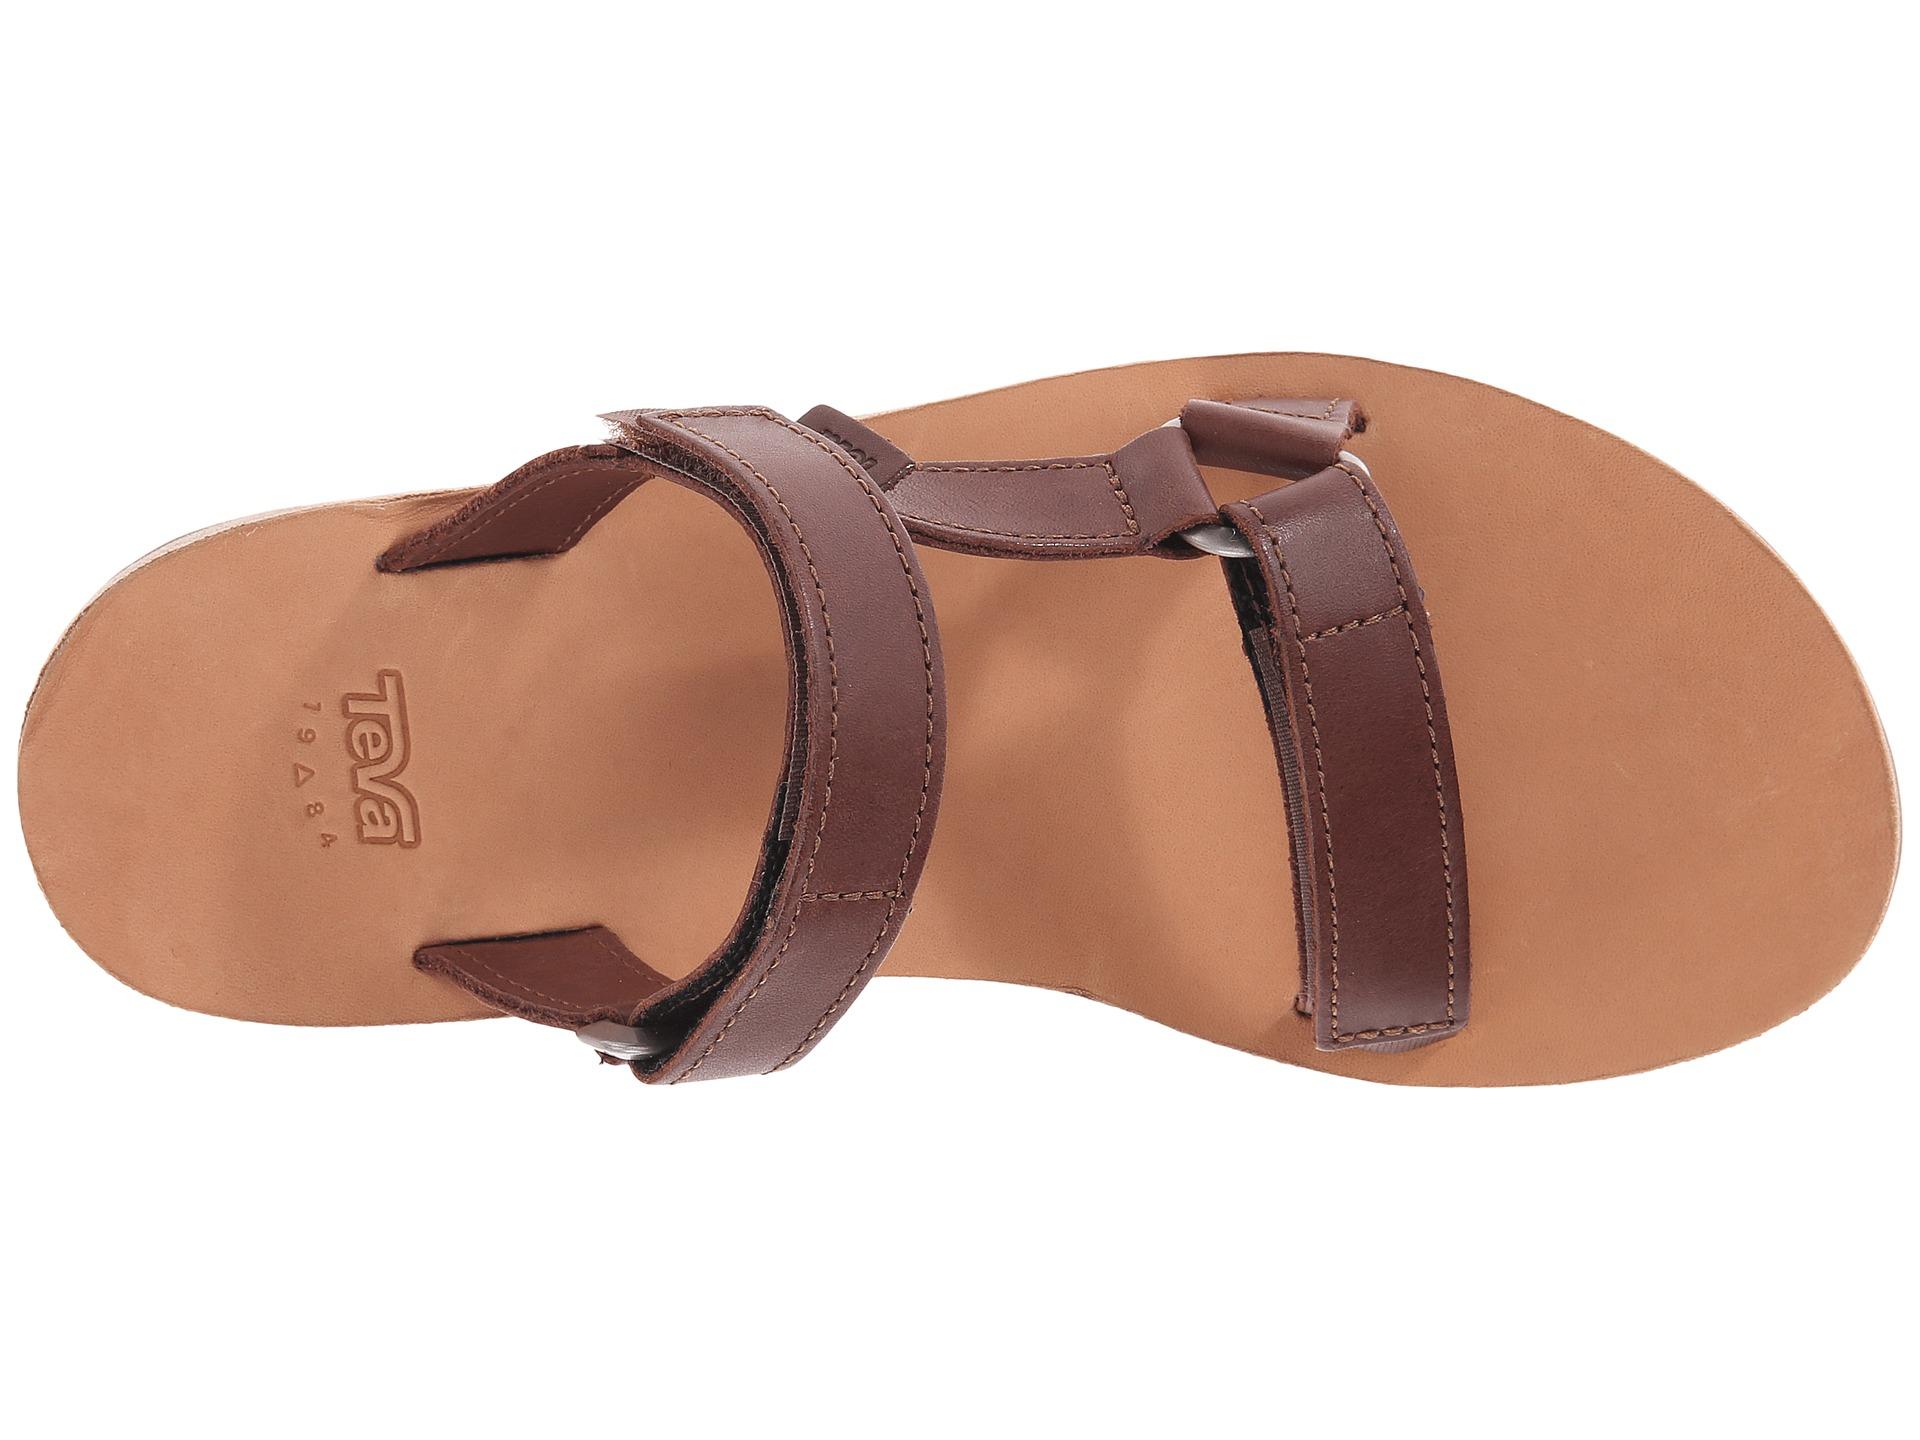 5569048e6 Lyst - Teva Universal Slide Leather in Brown